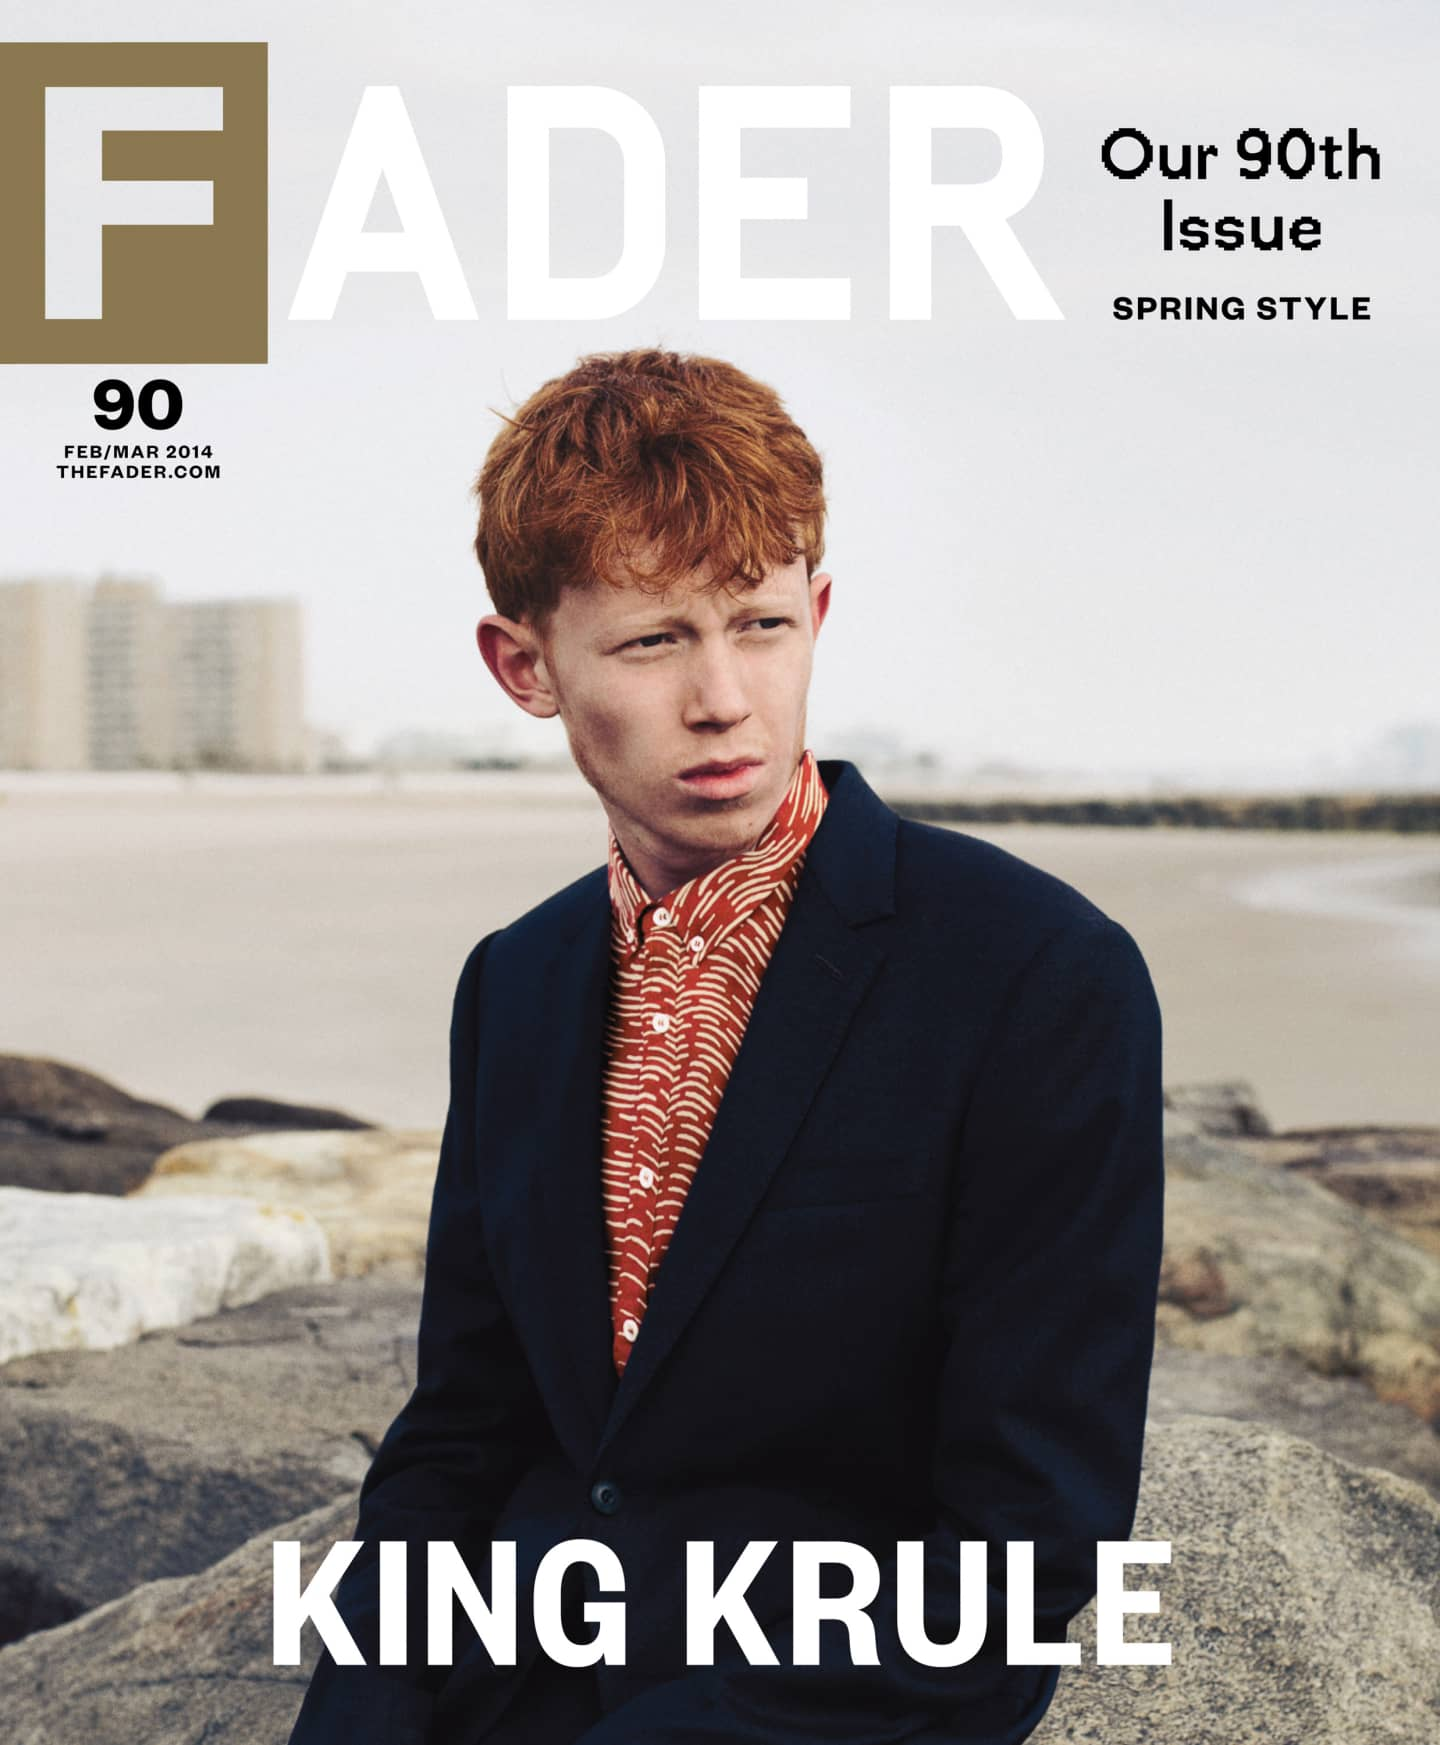 King Krule fader